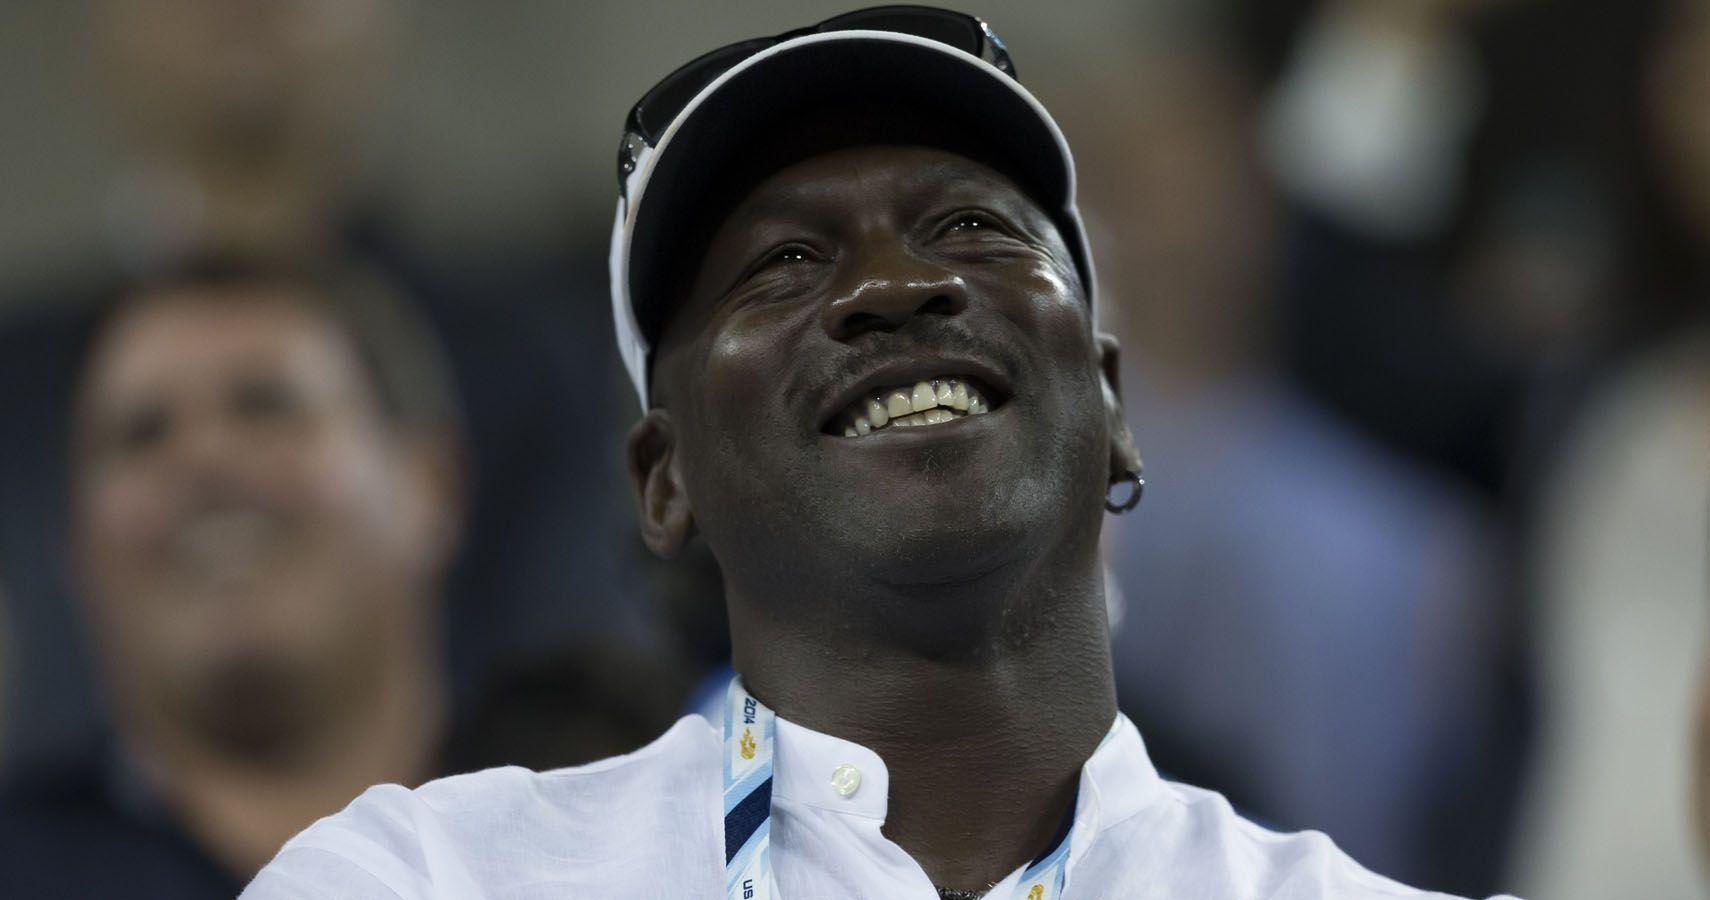 Michael Jordan Brand Donates $1 million To College Journalism & Sports-Related Studies